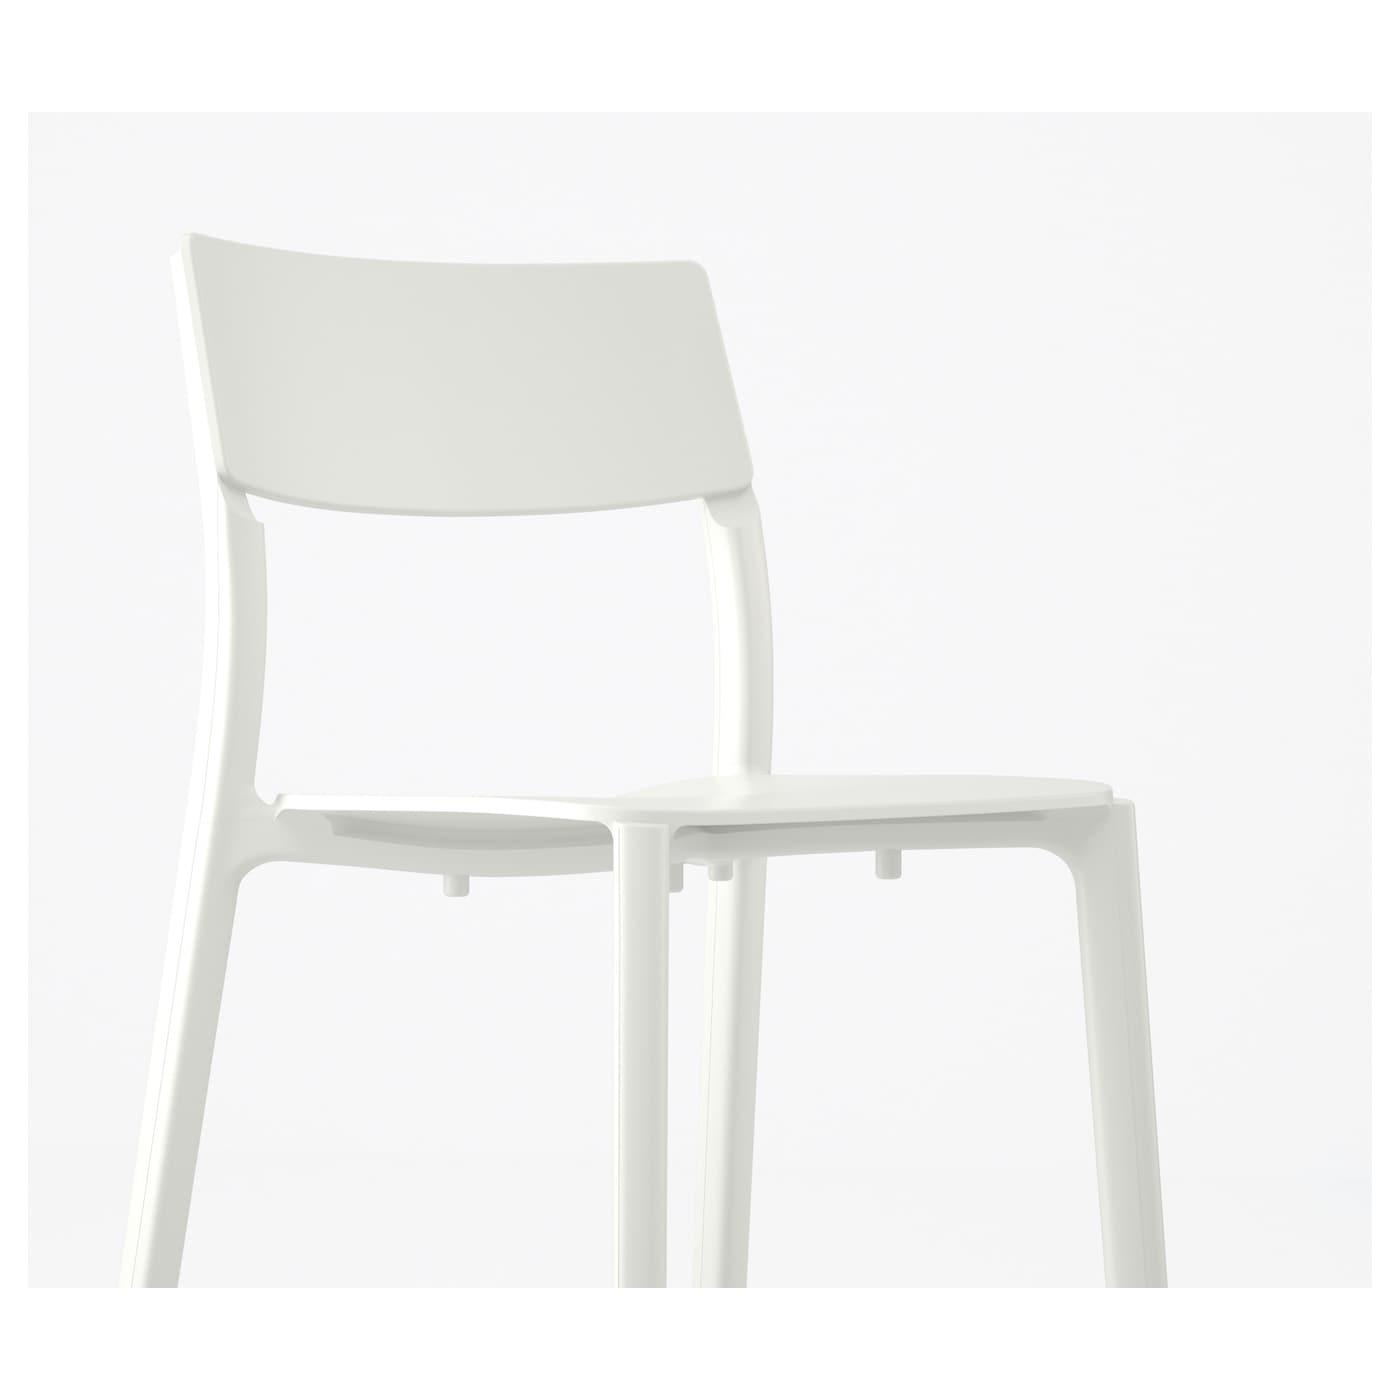 Janinge chair white ikea for Ikea white chair